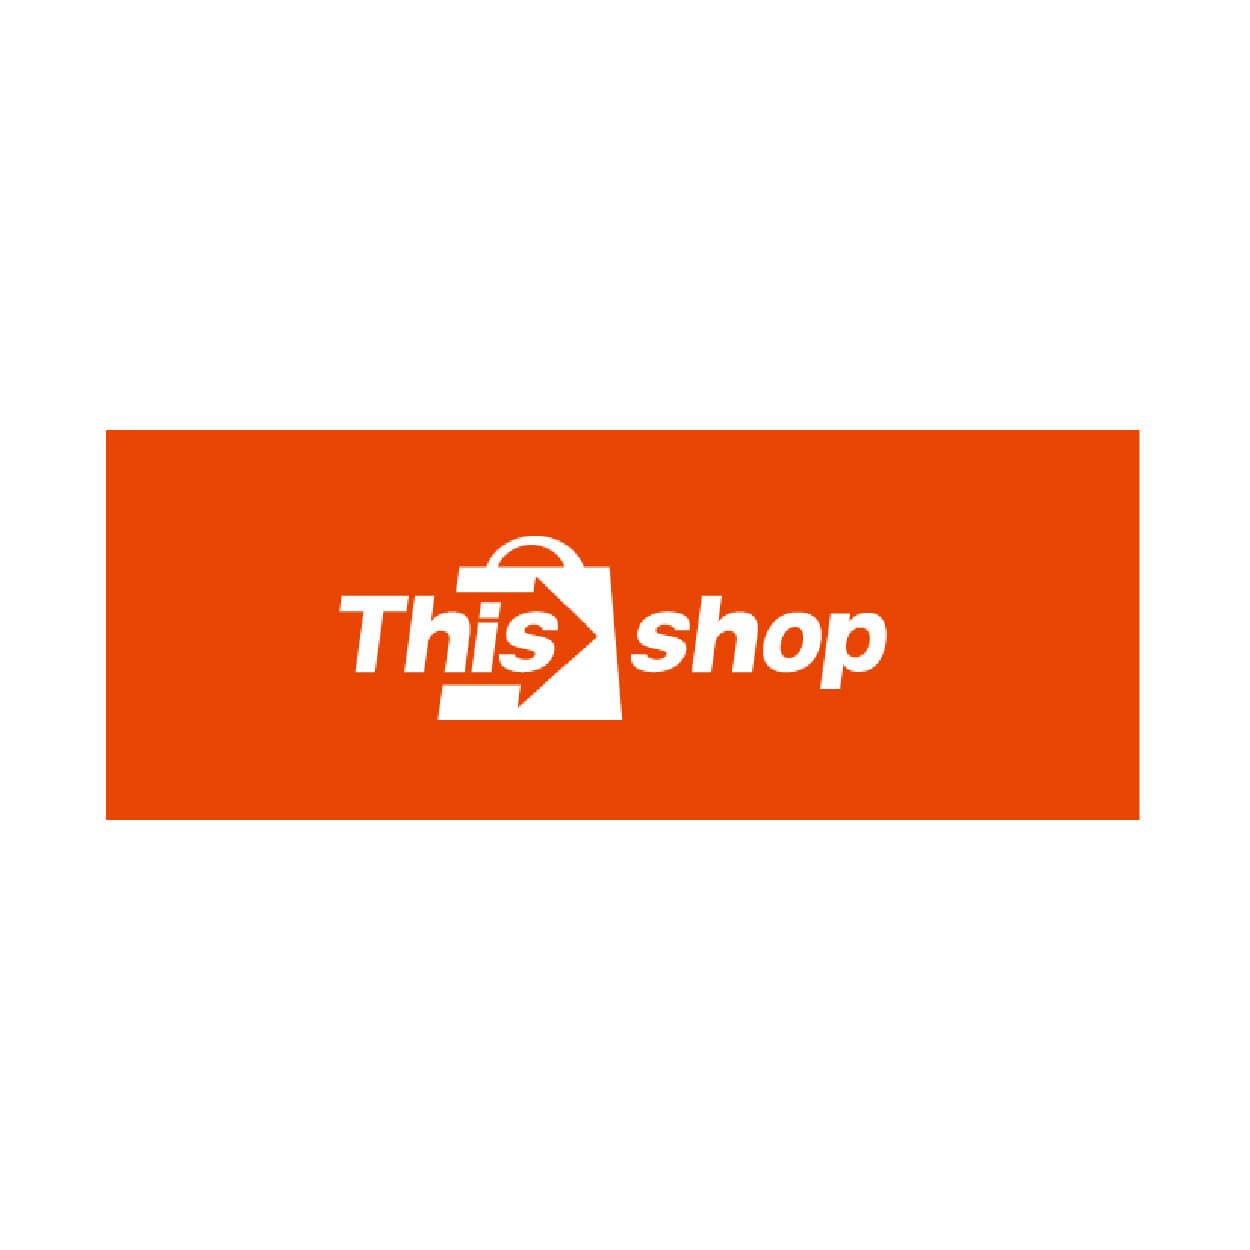 thailand-partnership-this-shop